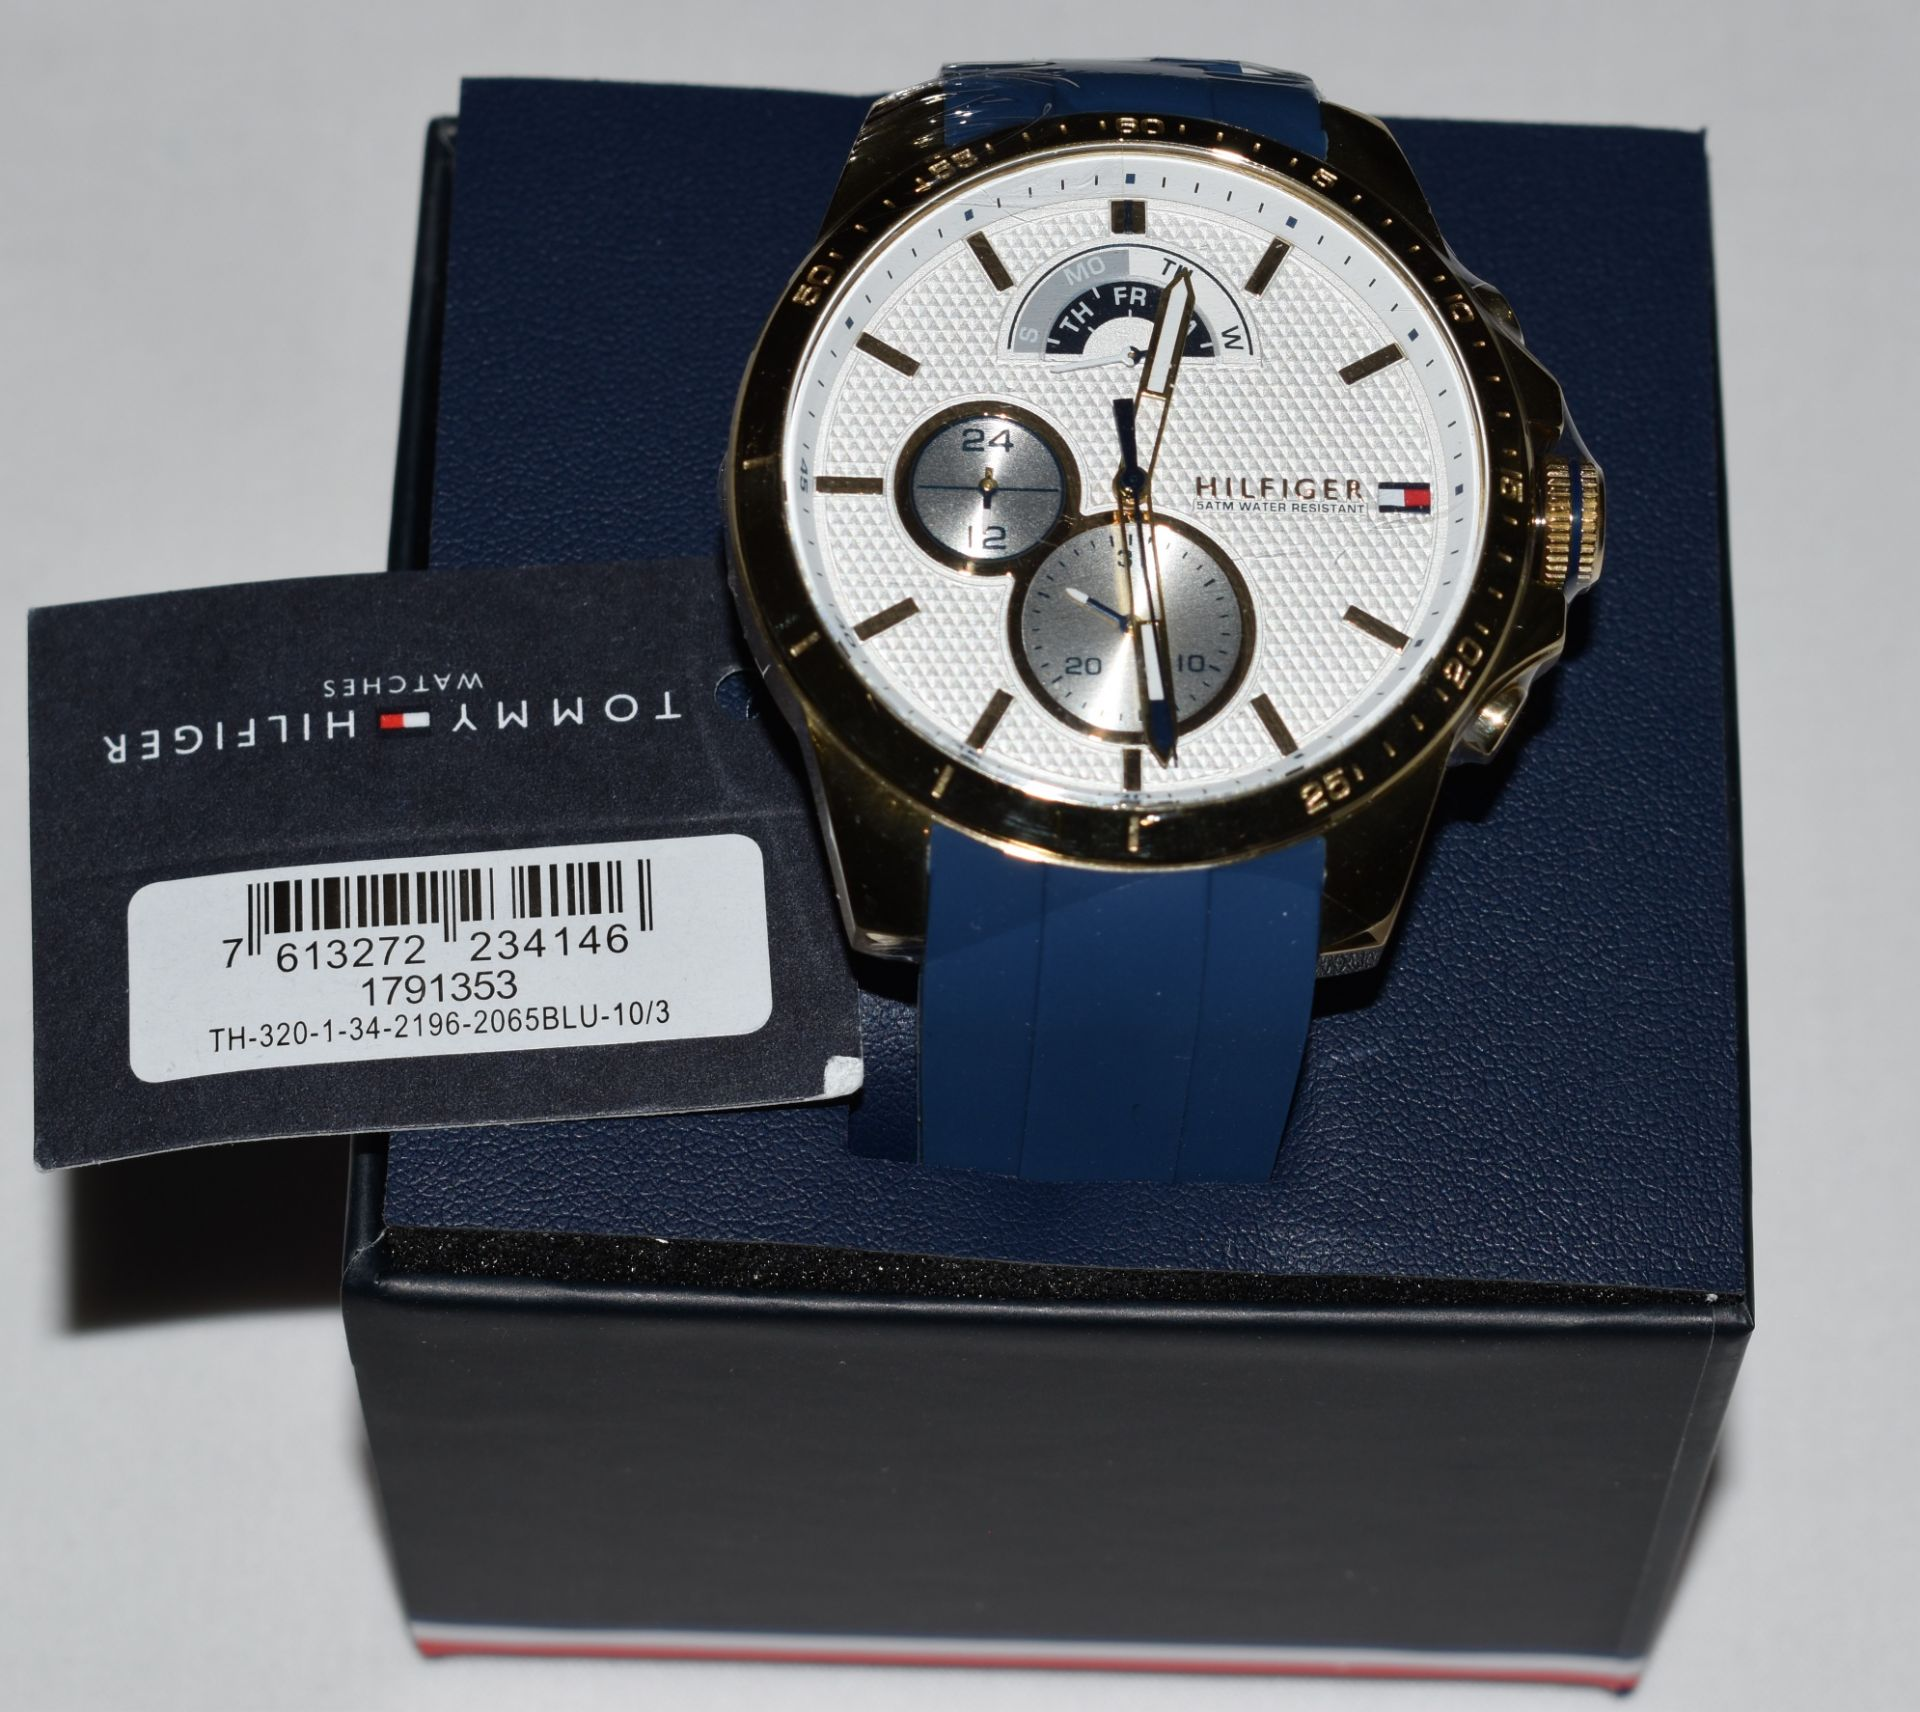 Tommy Hilfiger Men's Watch 1791353 - Image 2 of 2